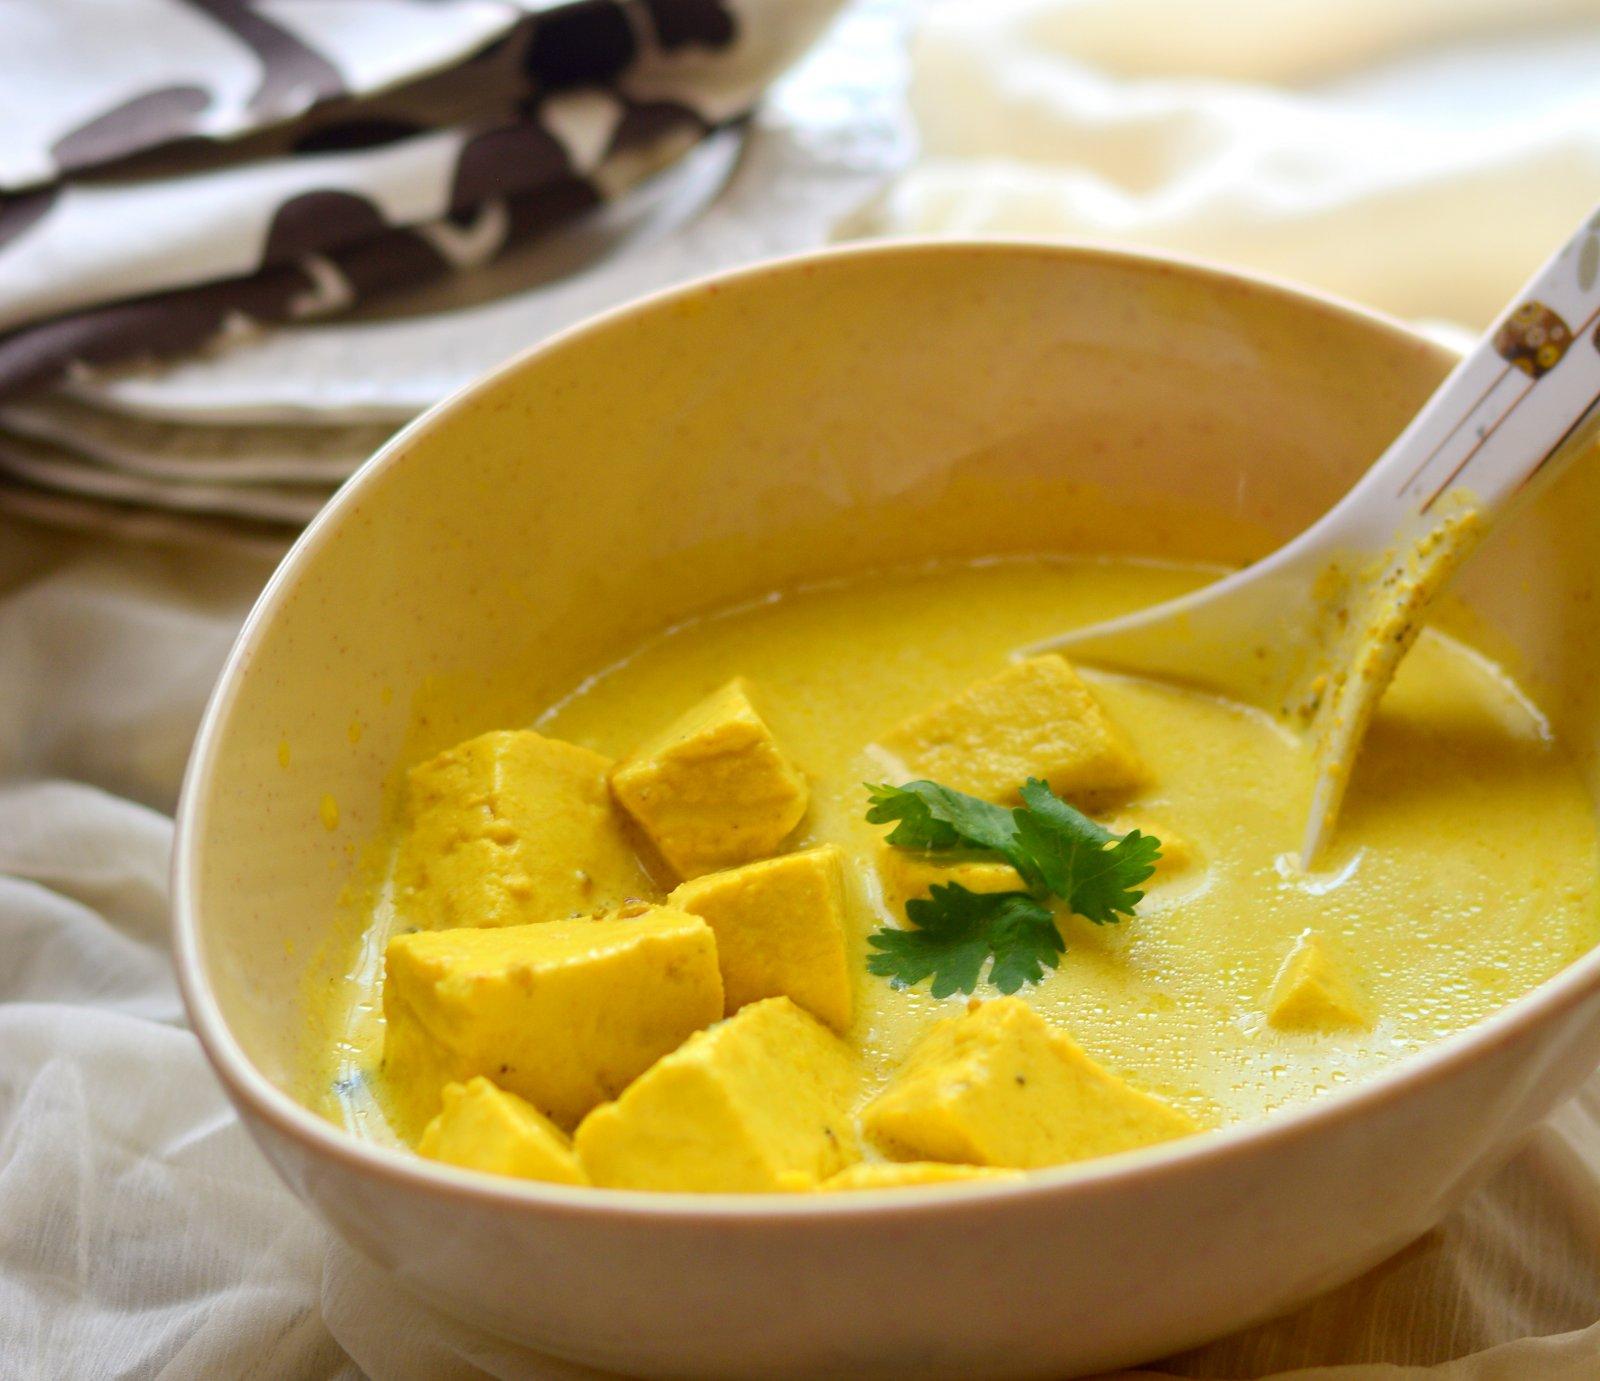 Chaman qaliya kashmiri cottage cheese curry recipe by archanas chaman qaliya kashmiri cottage cheese curry recipe forumfinder Gallery